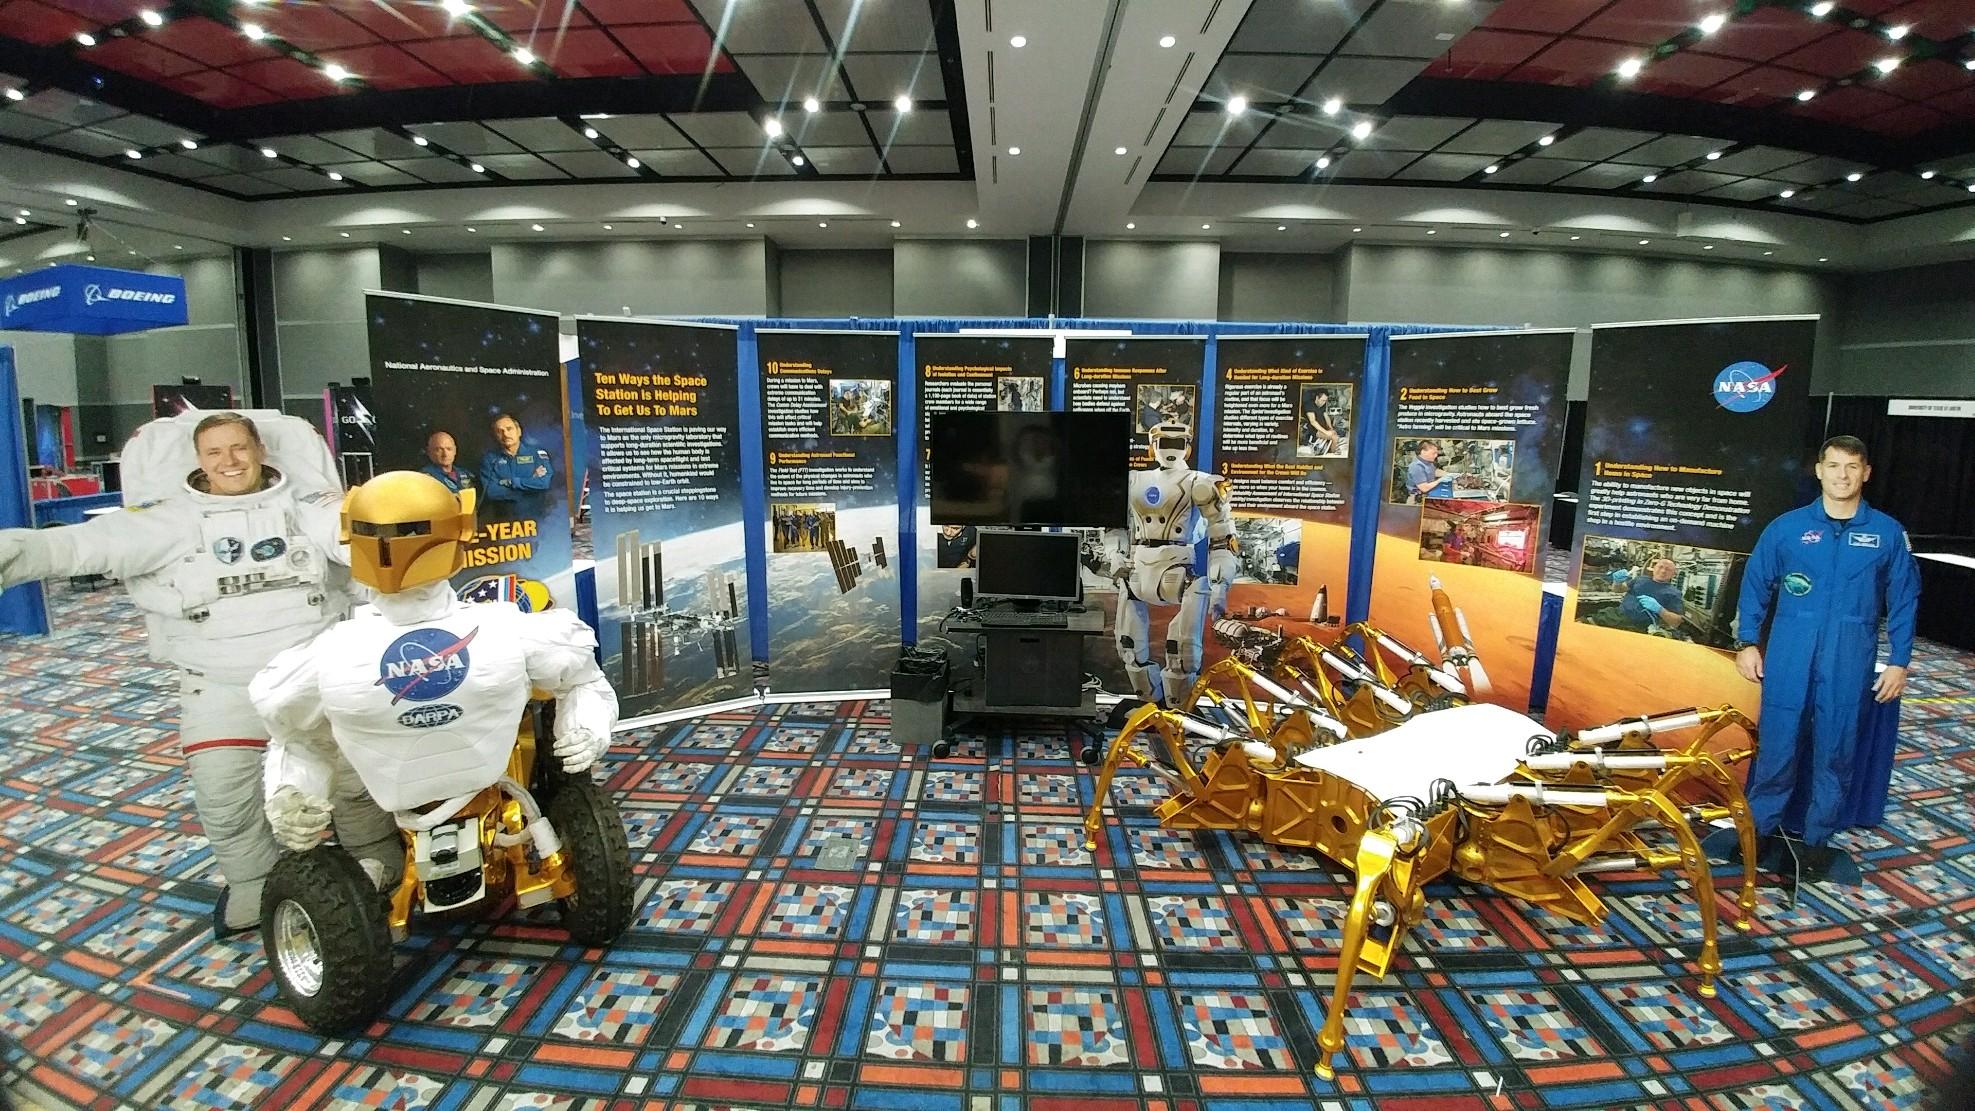 NASA Spidernaut and Centaur exhibit at FRC Innovation Faire Houston, TX